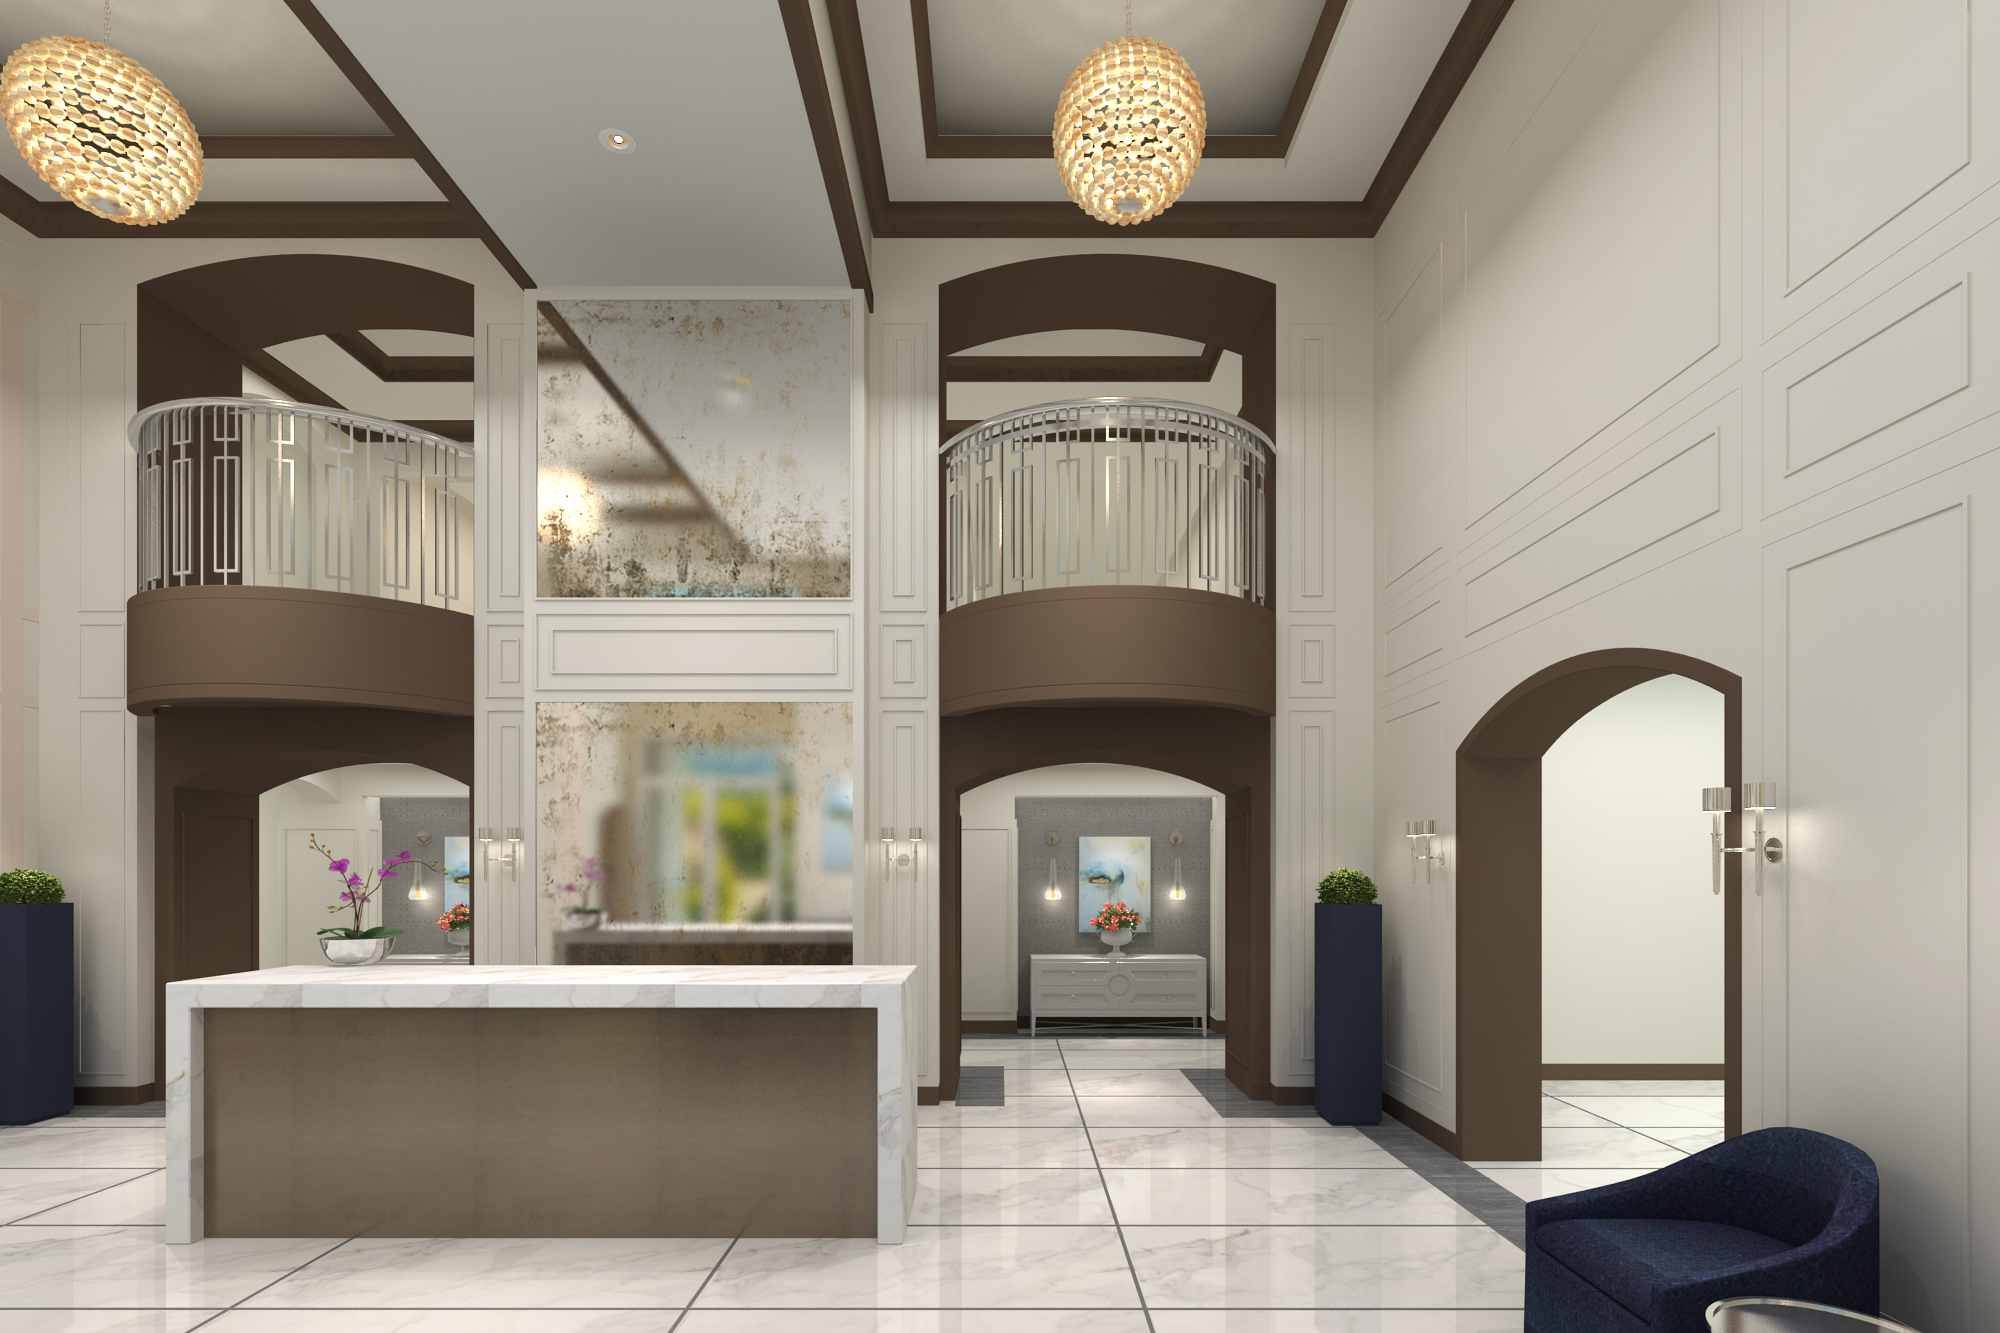 1200 Post Oak revised lobby approval 4.jpg